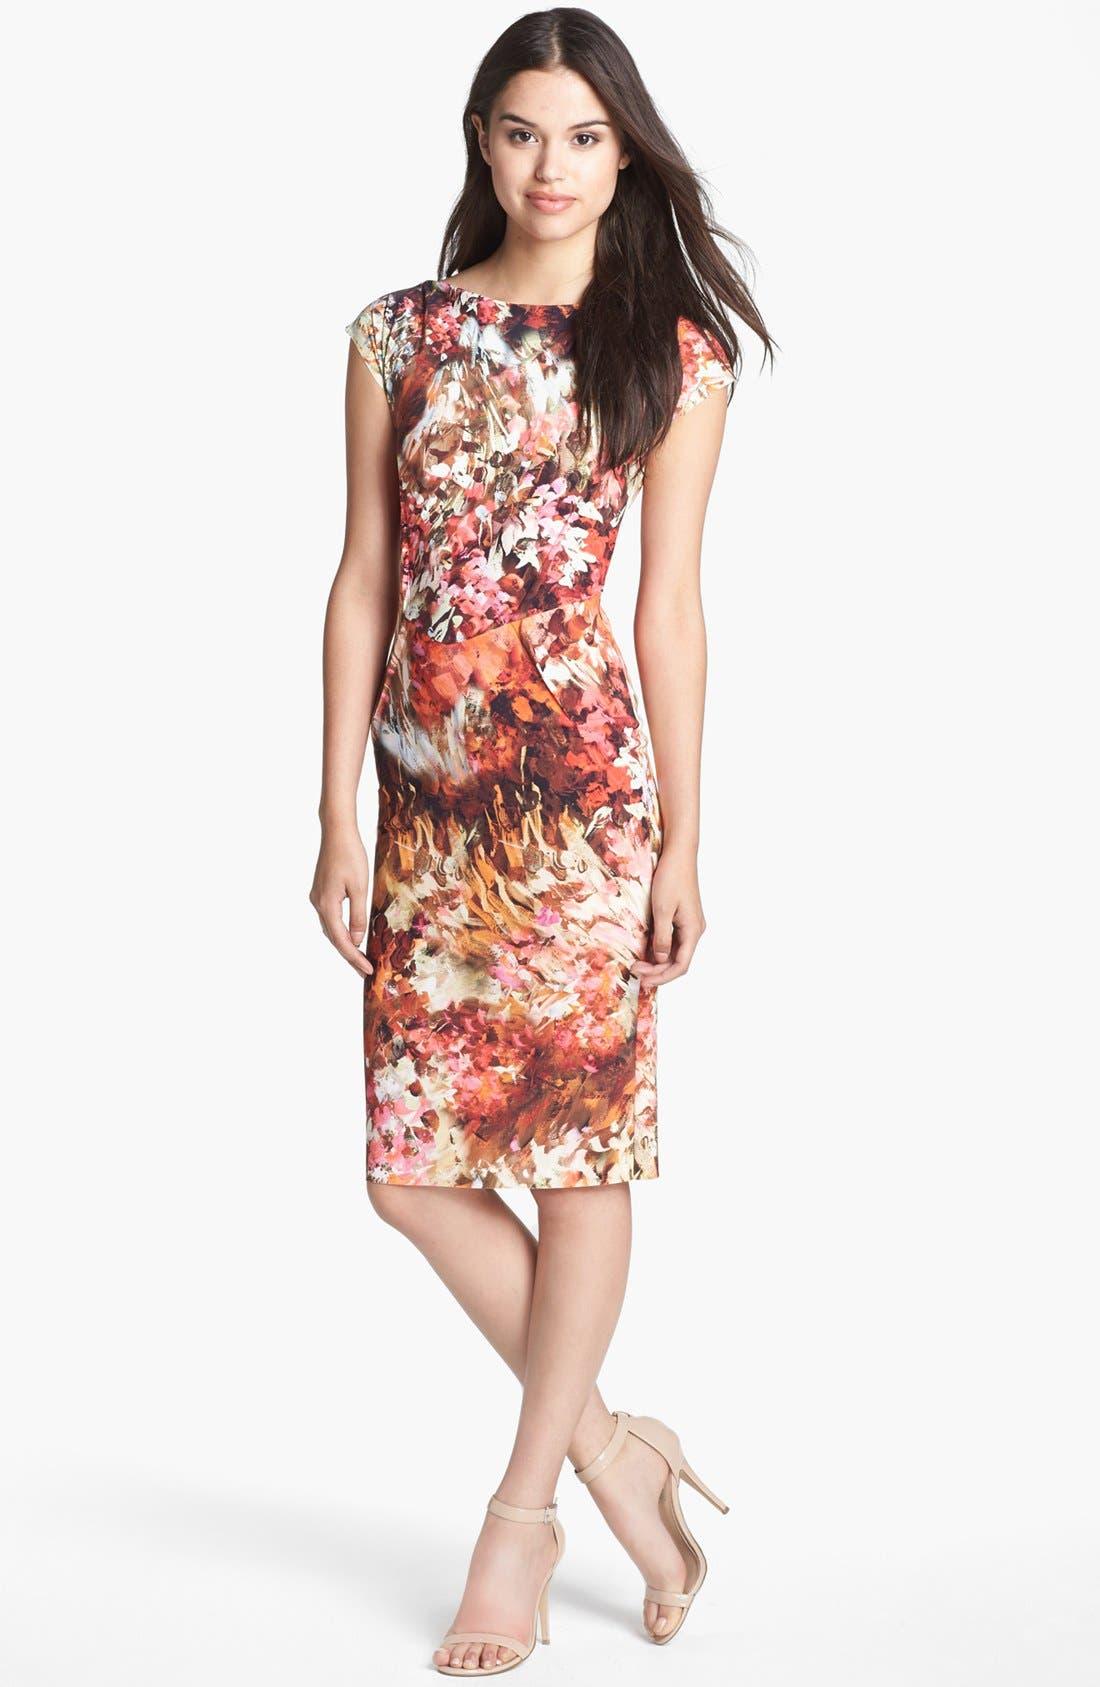 Alternate Image 1 Selected - La Petite Robe by Chiara Boni Print Jersey Sheath Dress